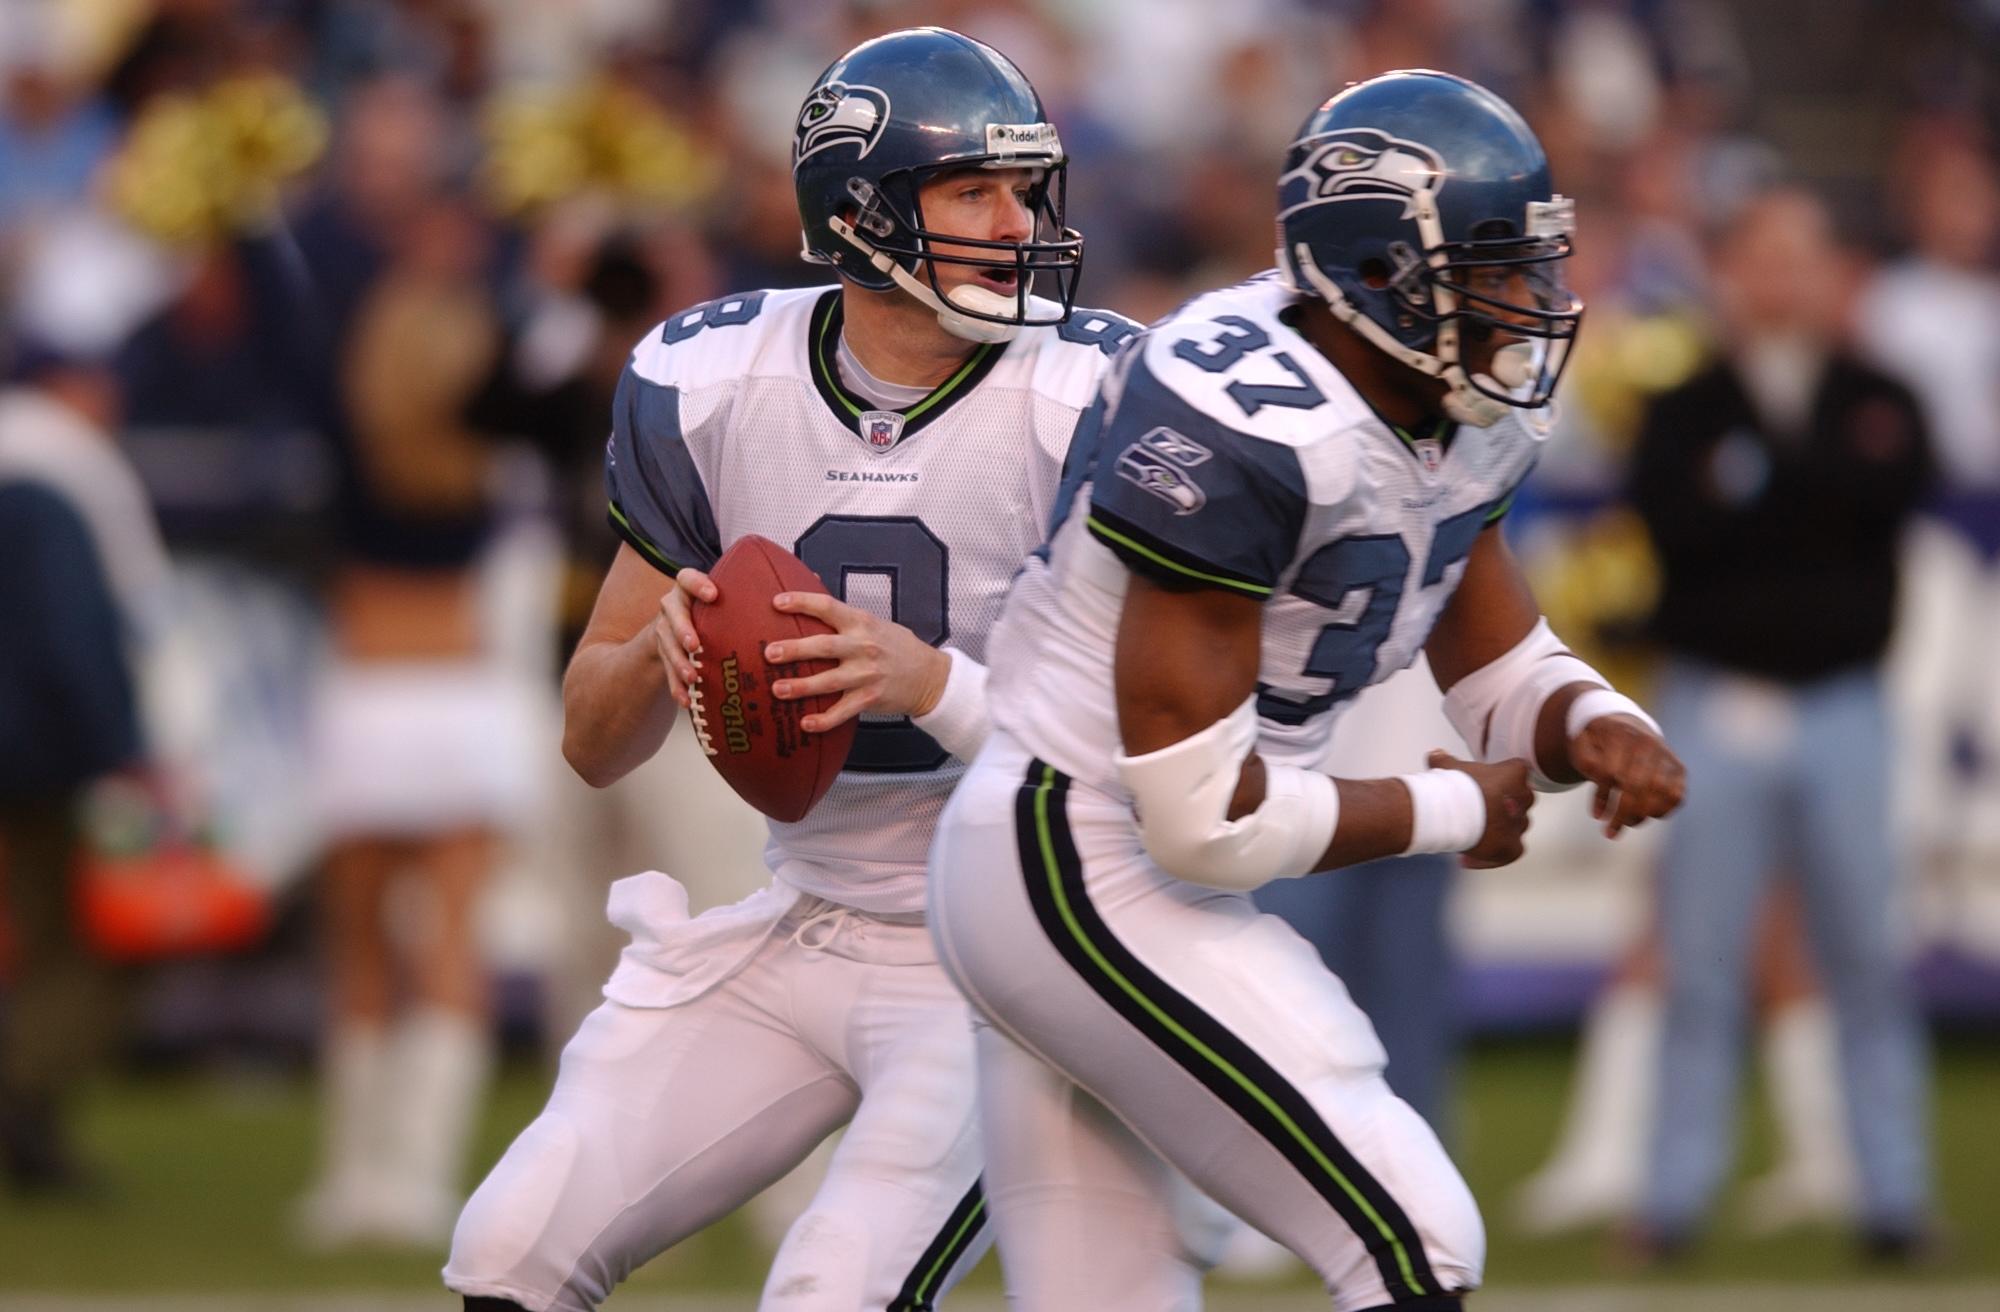 Seahawks quarterback Matt Hasselbeck